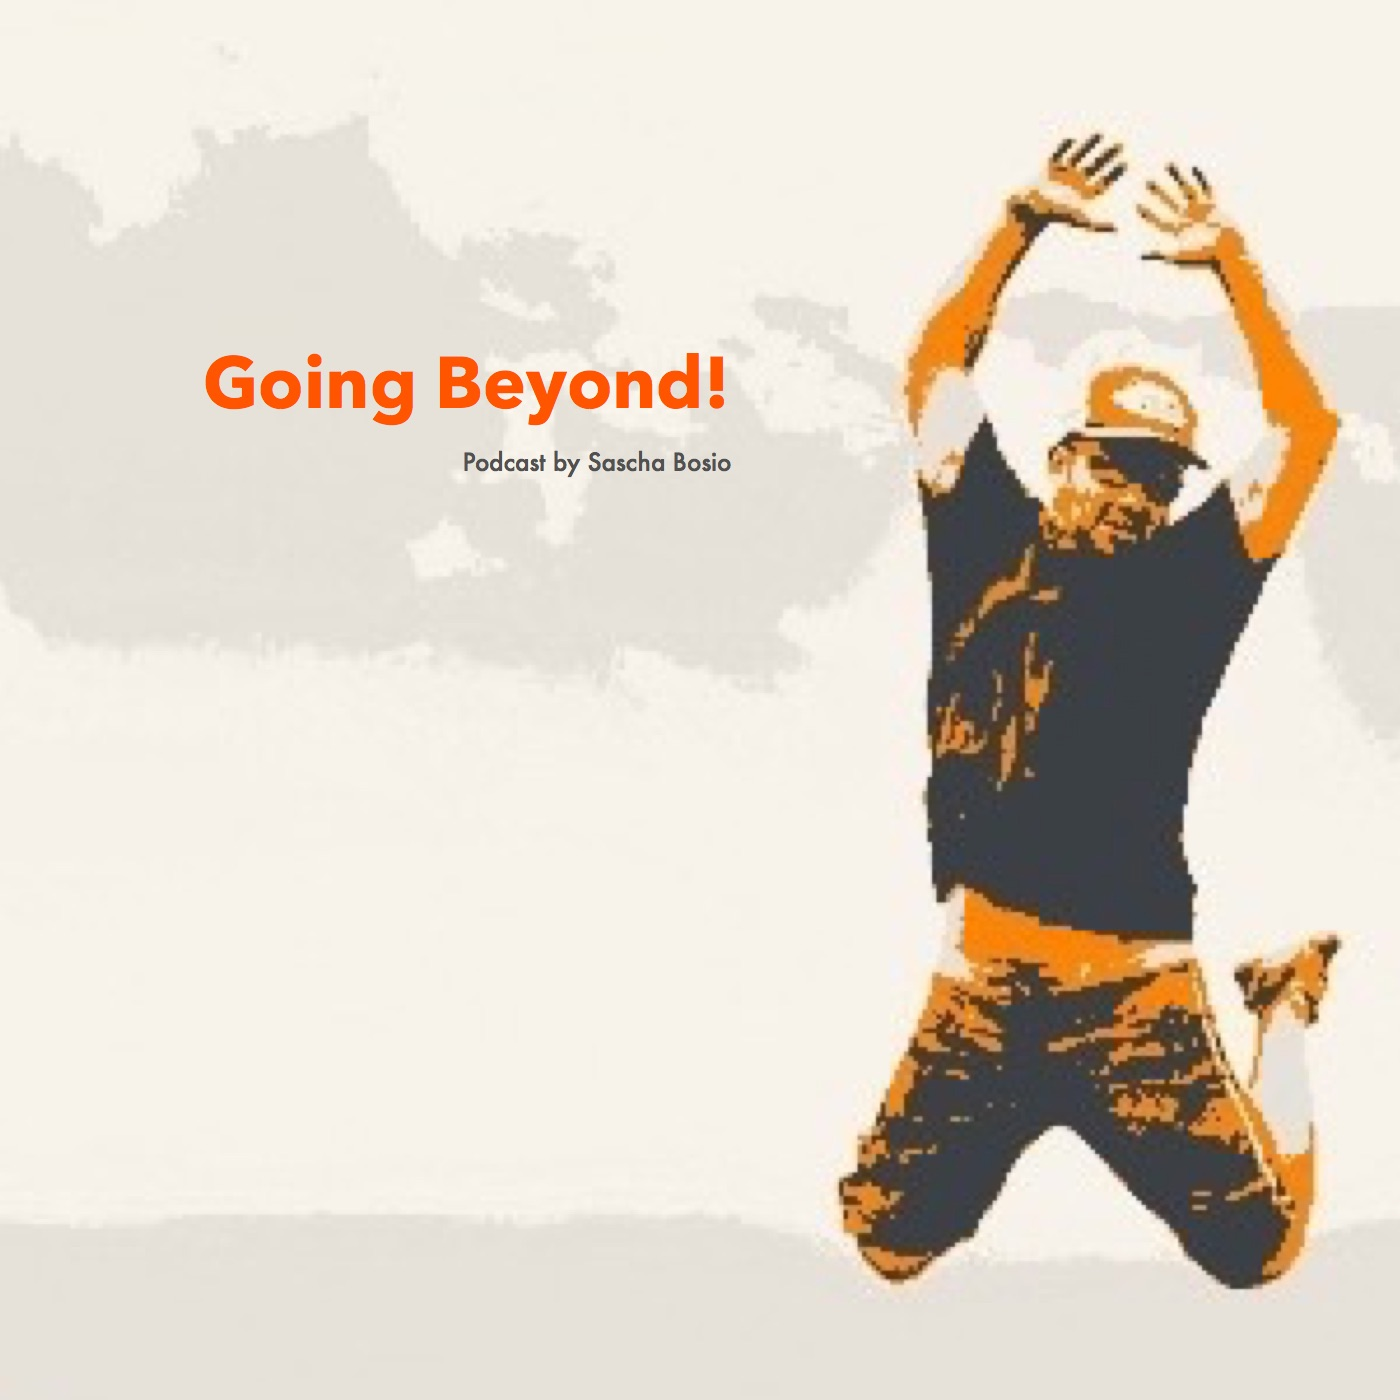 Going Beyond!